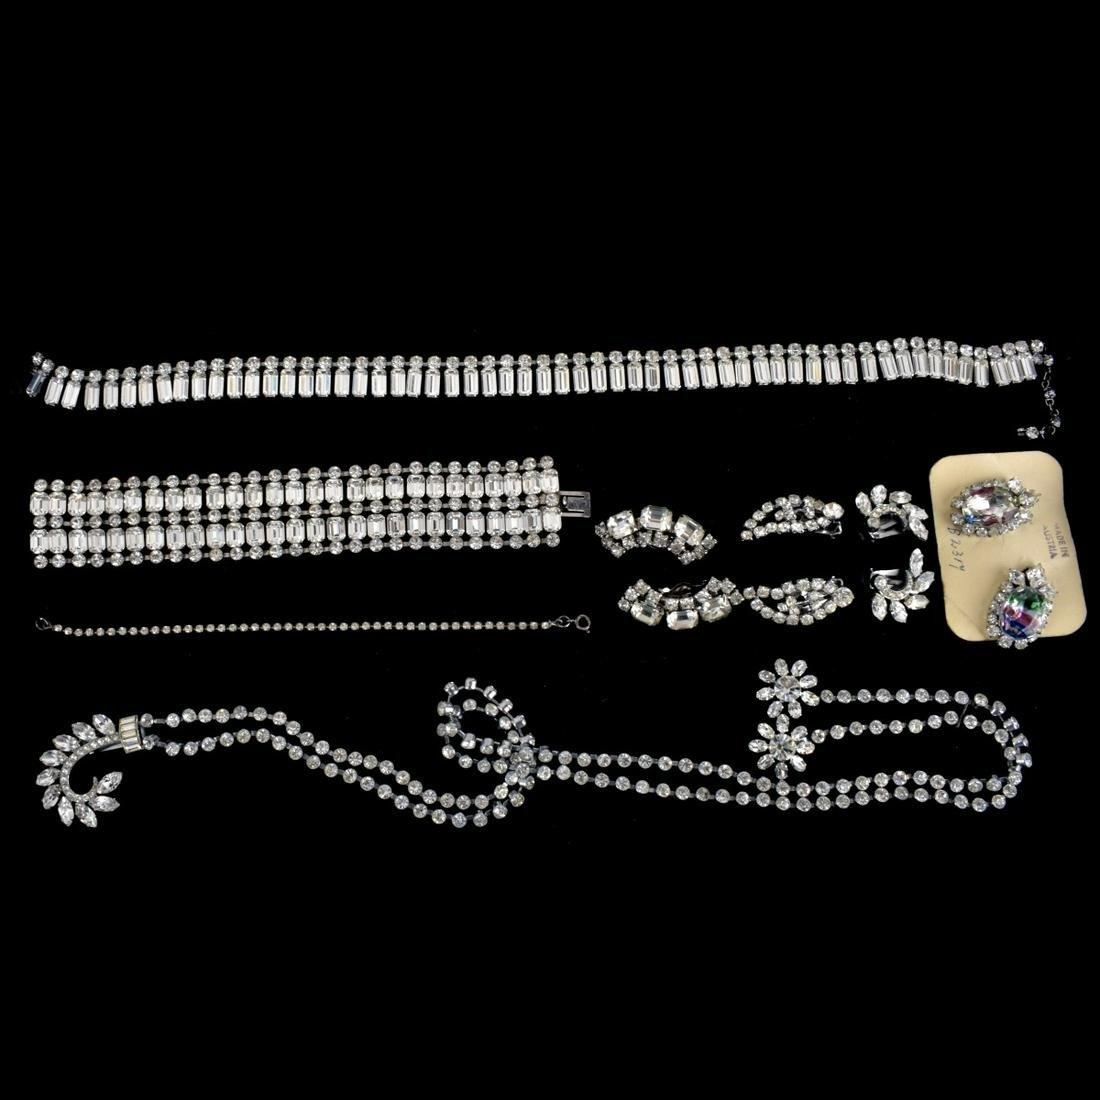 Collection of Rhinestone Jewelry